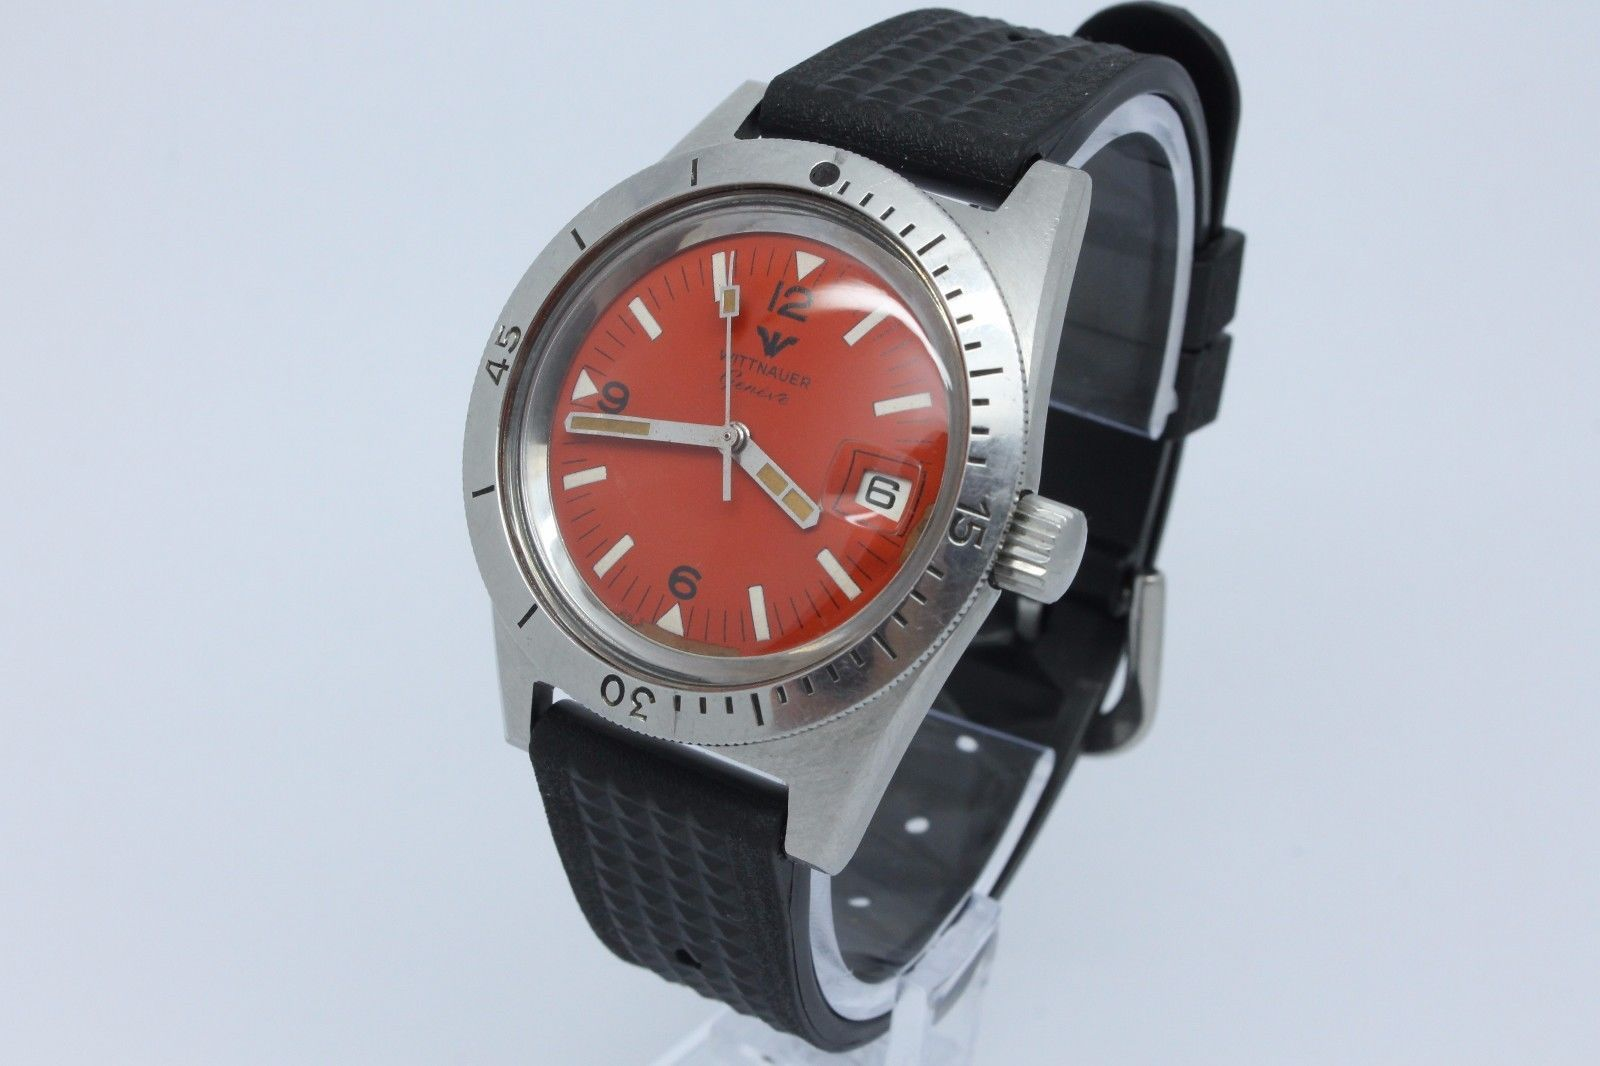 vintage wittnauer skin diver 38mm steel mens watch manual c11ks rare rh pinterest com Wittnauer Watches Model Numbers Vintage Wittnauer Ladies Watches